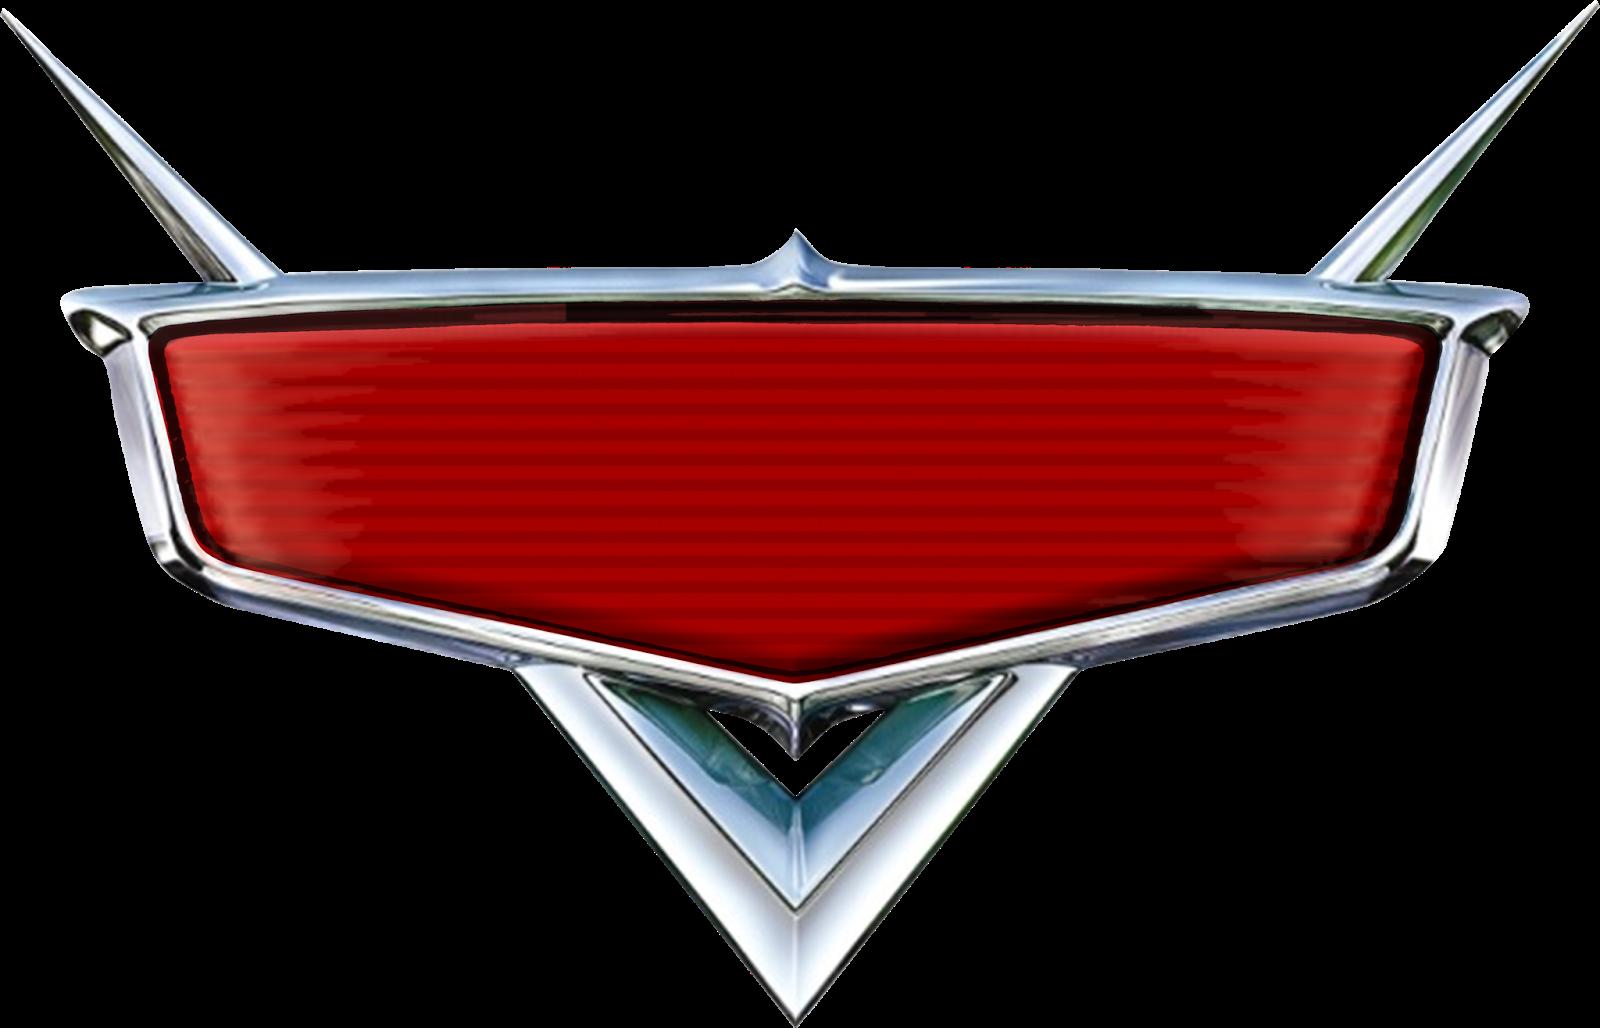 Short girl car sun visor clipart image royalty free library Cars Font Generator | Displaying 19> Images For - Disney Cars Font ... image royalty free library